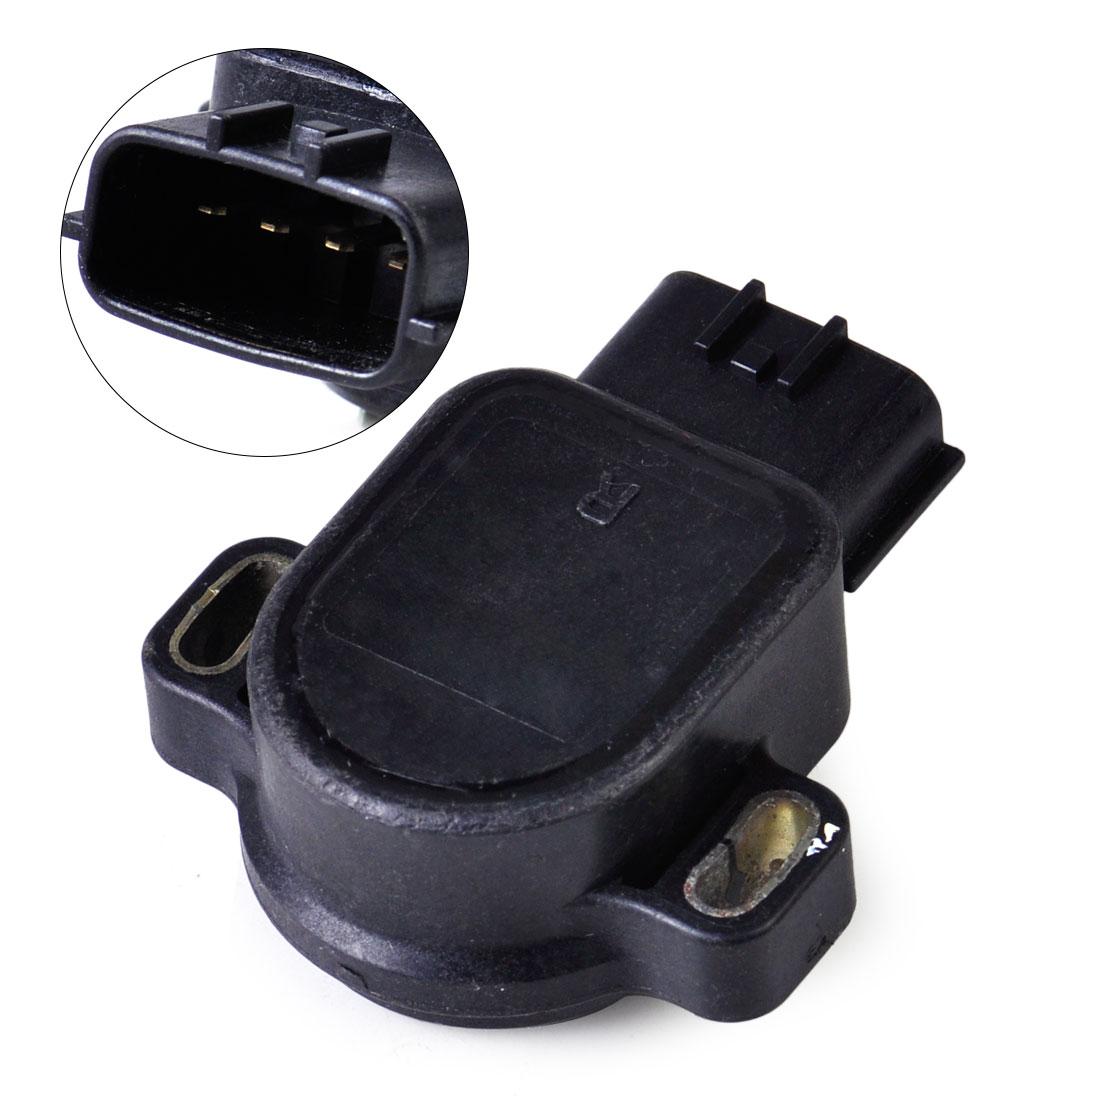 TPS Throttle Position Sensor For Subaru Forester Impreza Legazy Outback